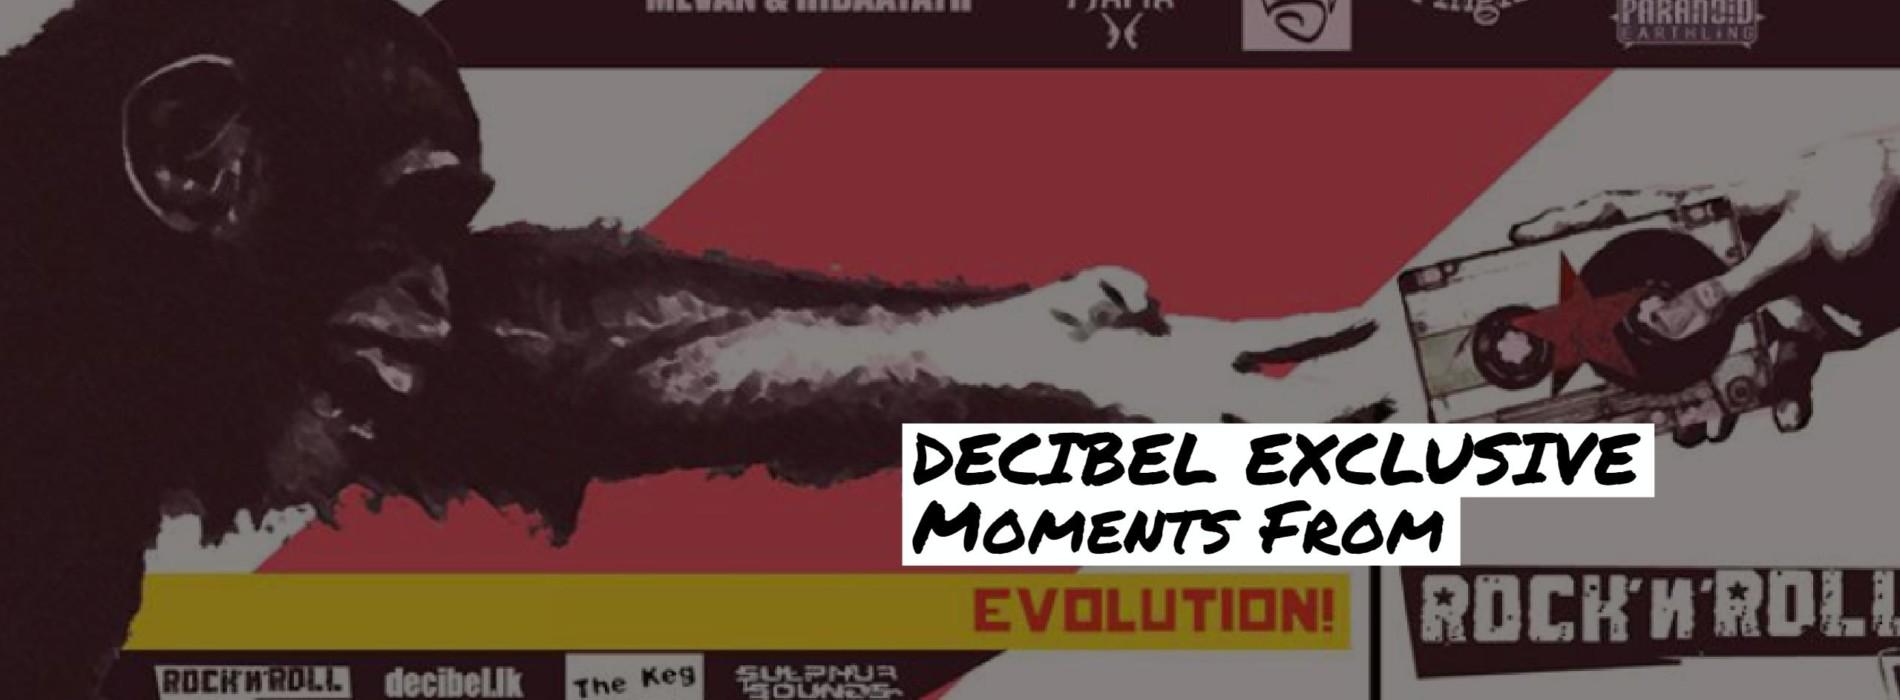 Decibel Exclusive : Moments From Rock N Roll ii